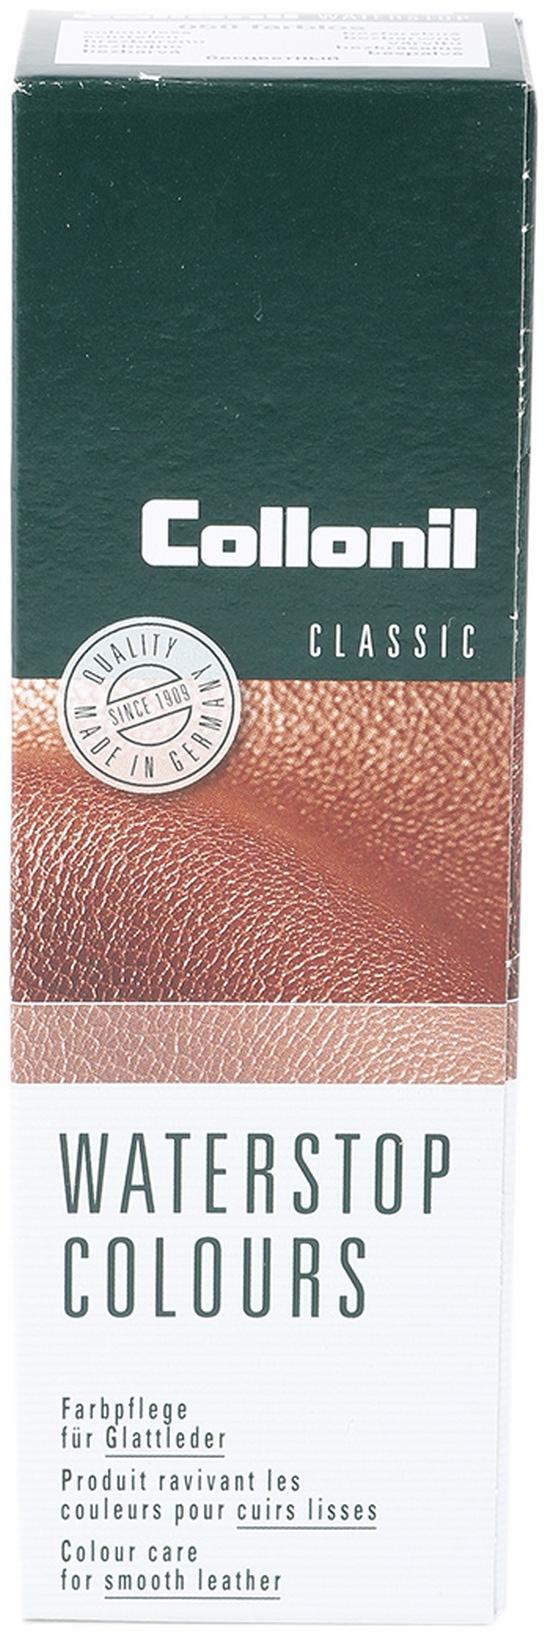 Collonil Waterstop Leather Cream Scotch foto 0